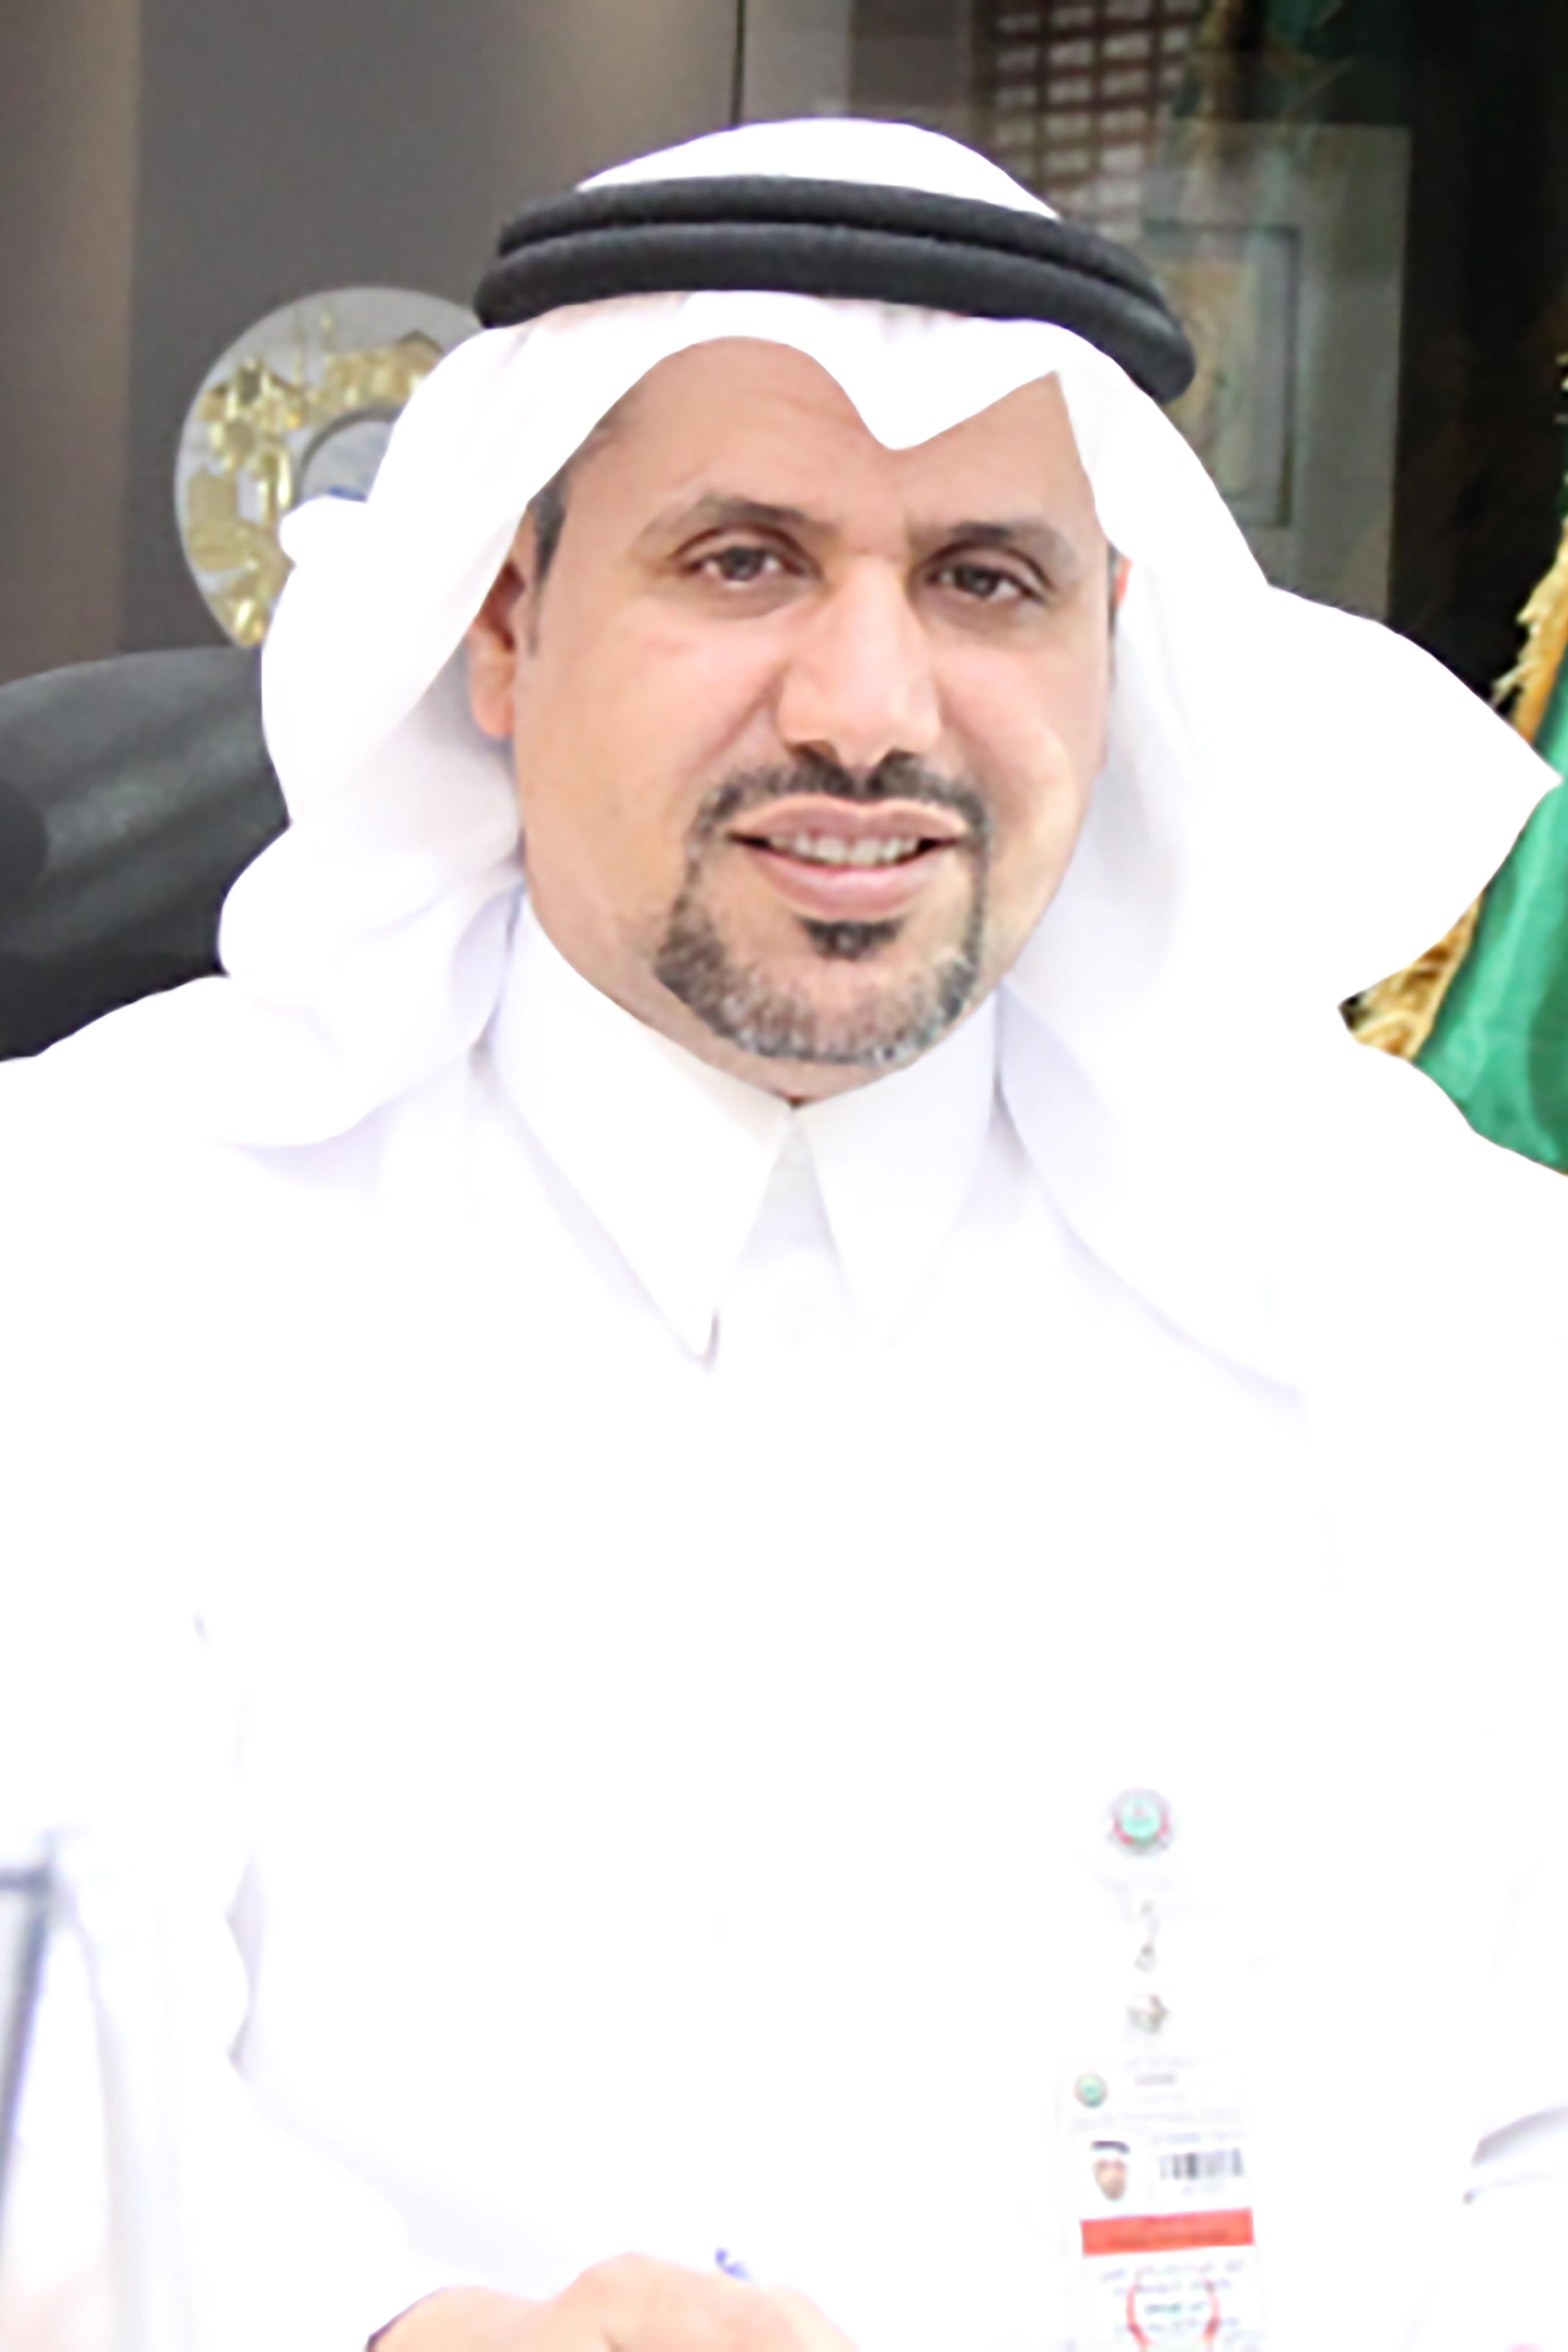 Dr.Meshari F. Al-Otaibi